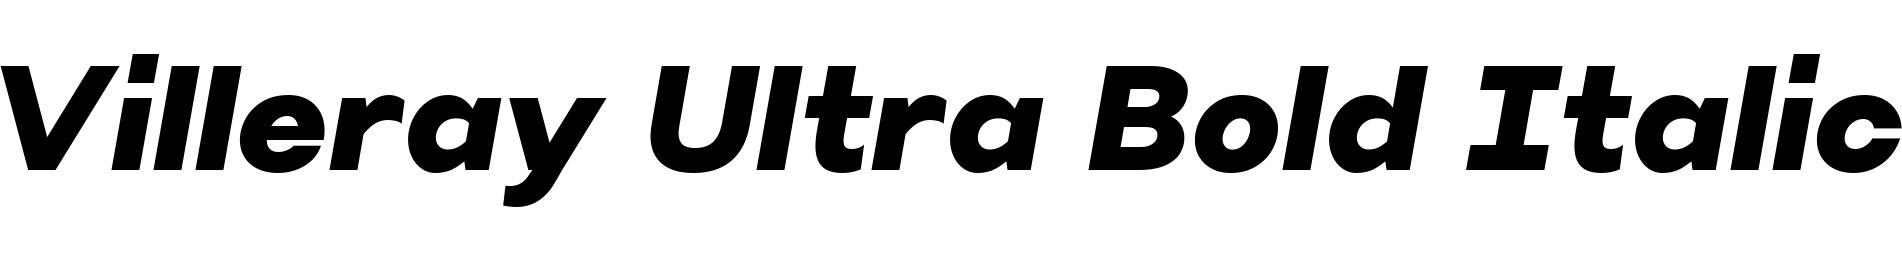 Villeray Ultra Bold Italic